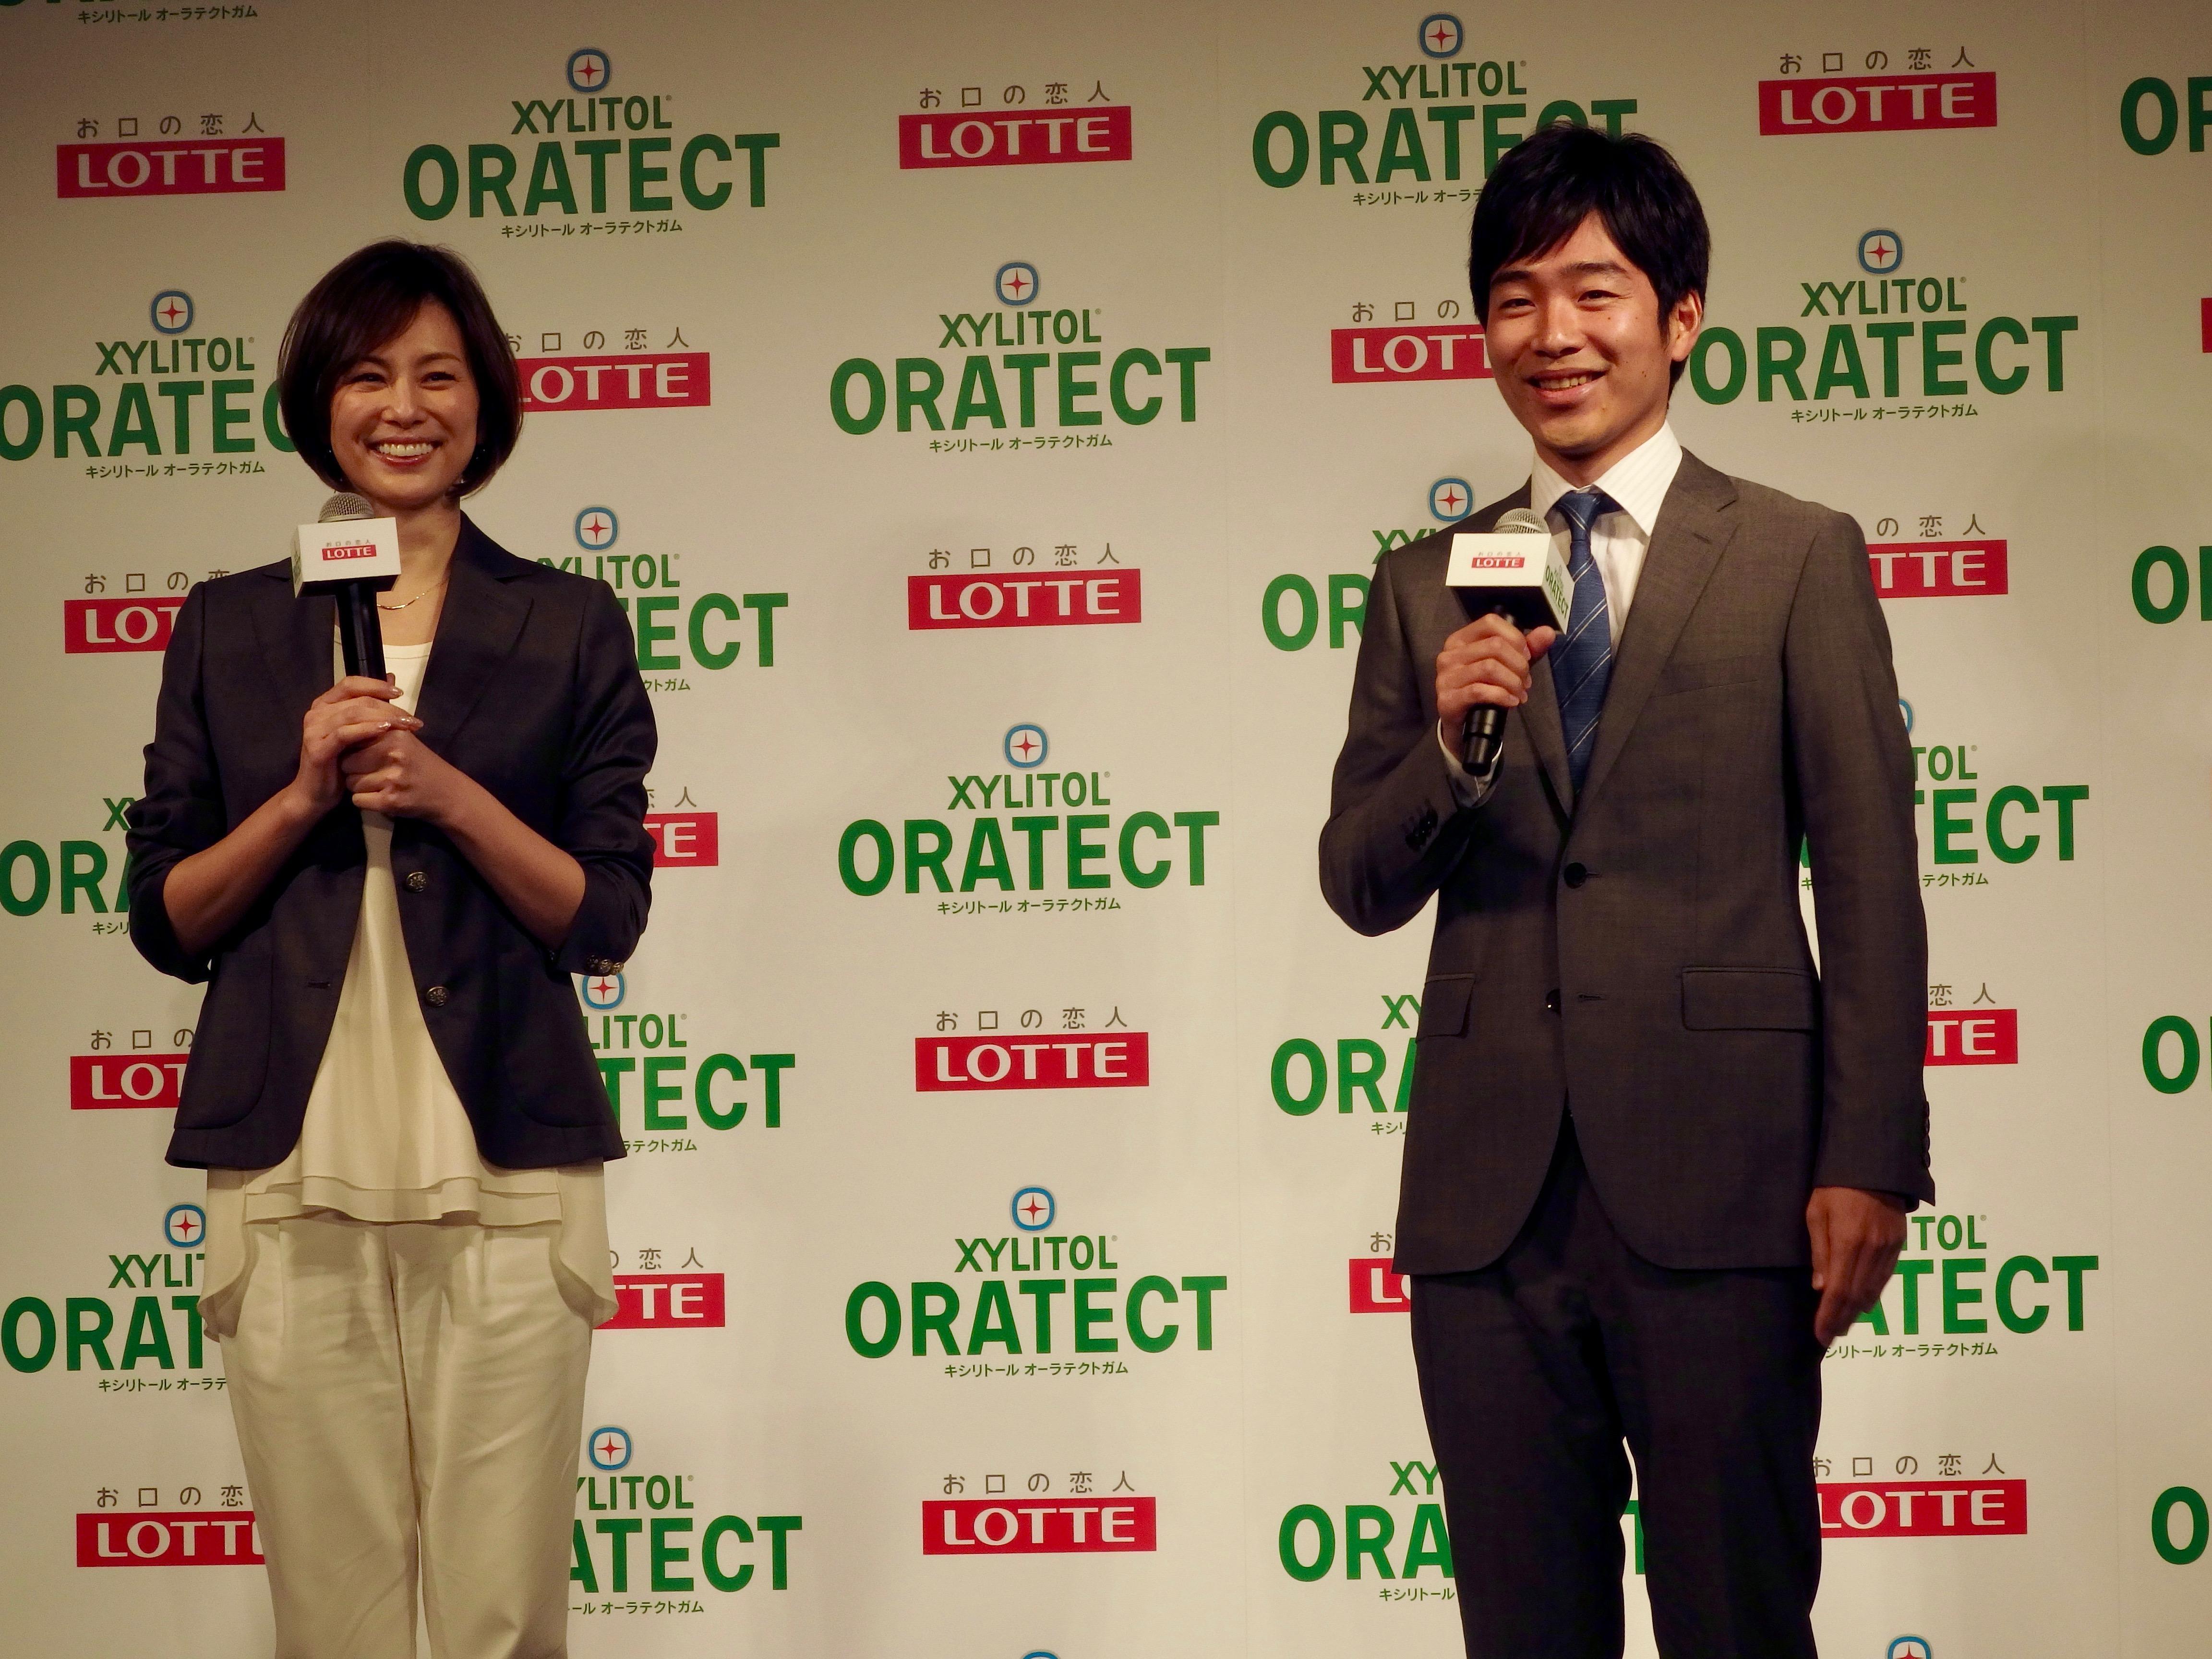 http://news.yoshimoto.co.jp/20170314195950-f4c5610249a785cc11578fab5f1ae52081944cf1.jpg